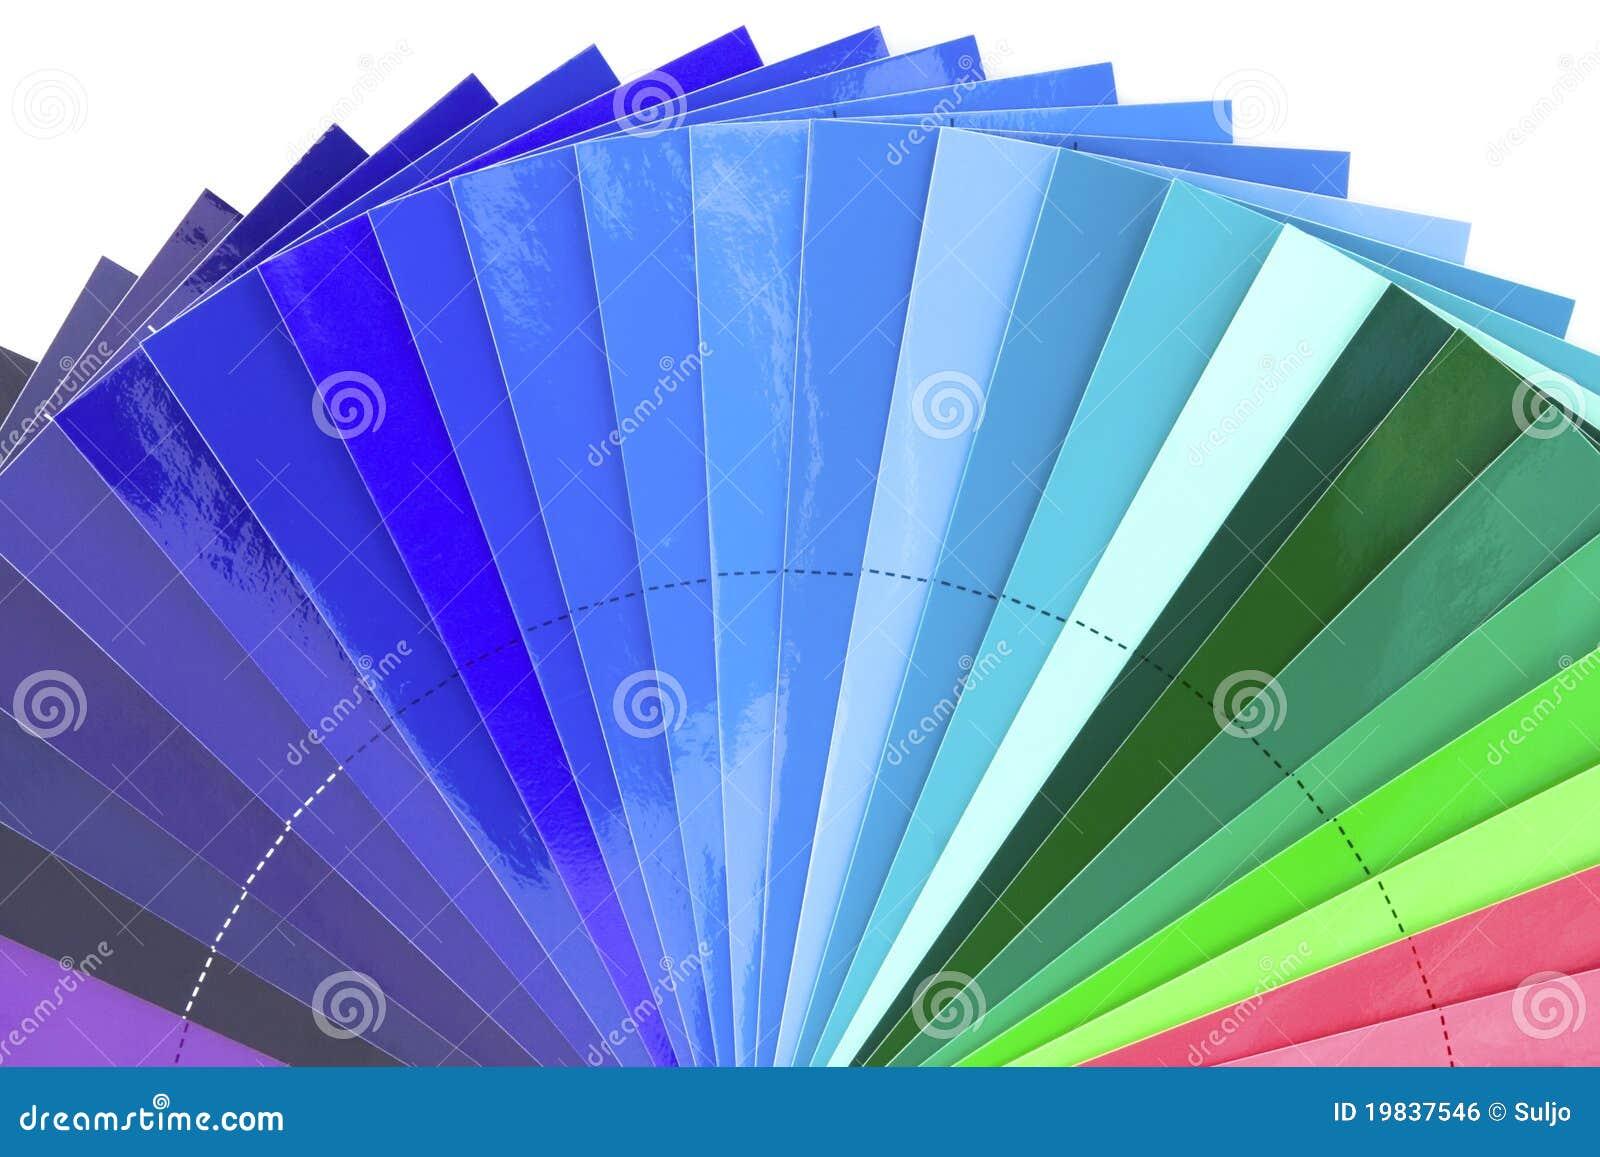 Blue color tones